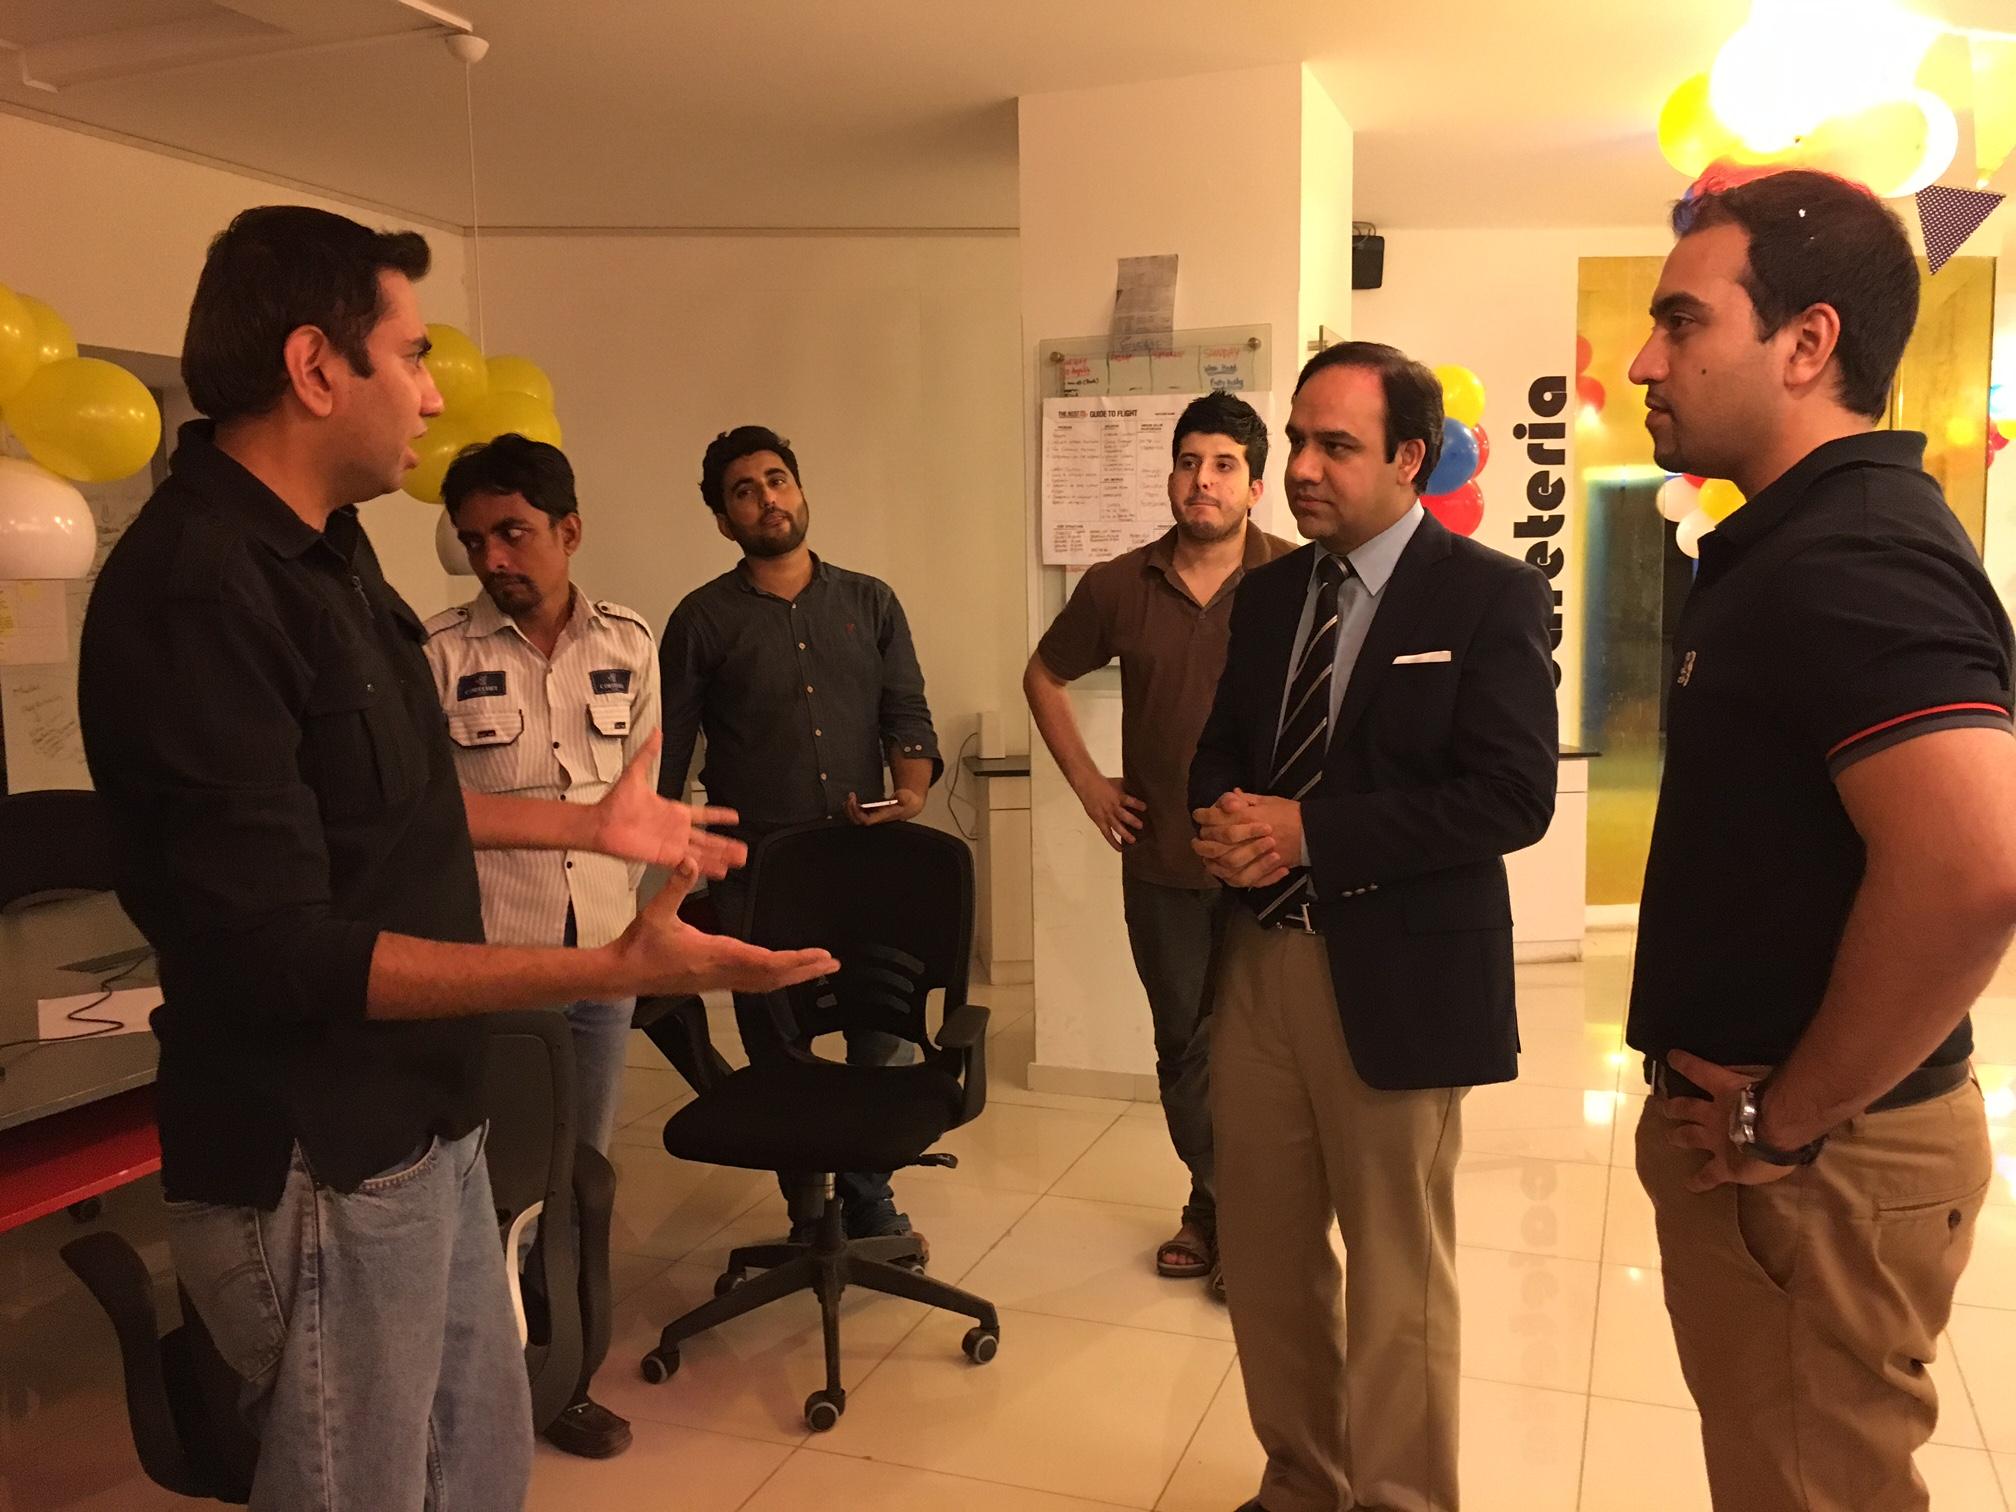 Knavix selling maps to Umar Saif